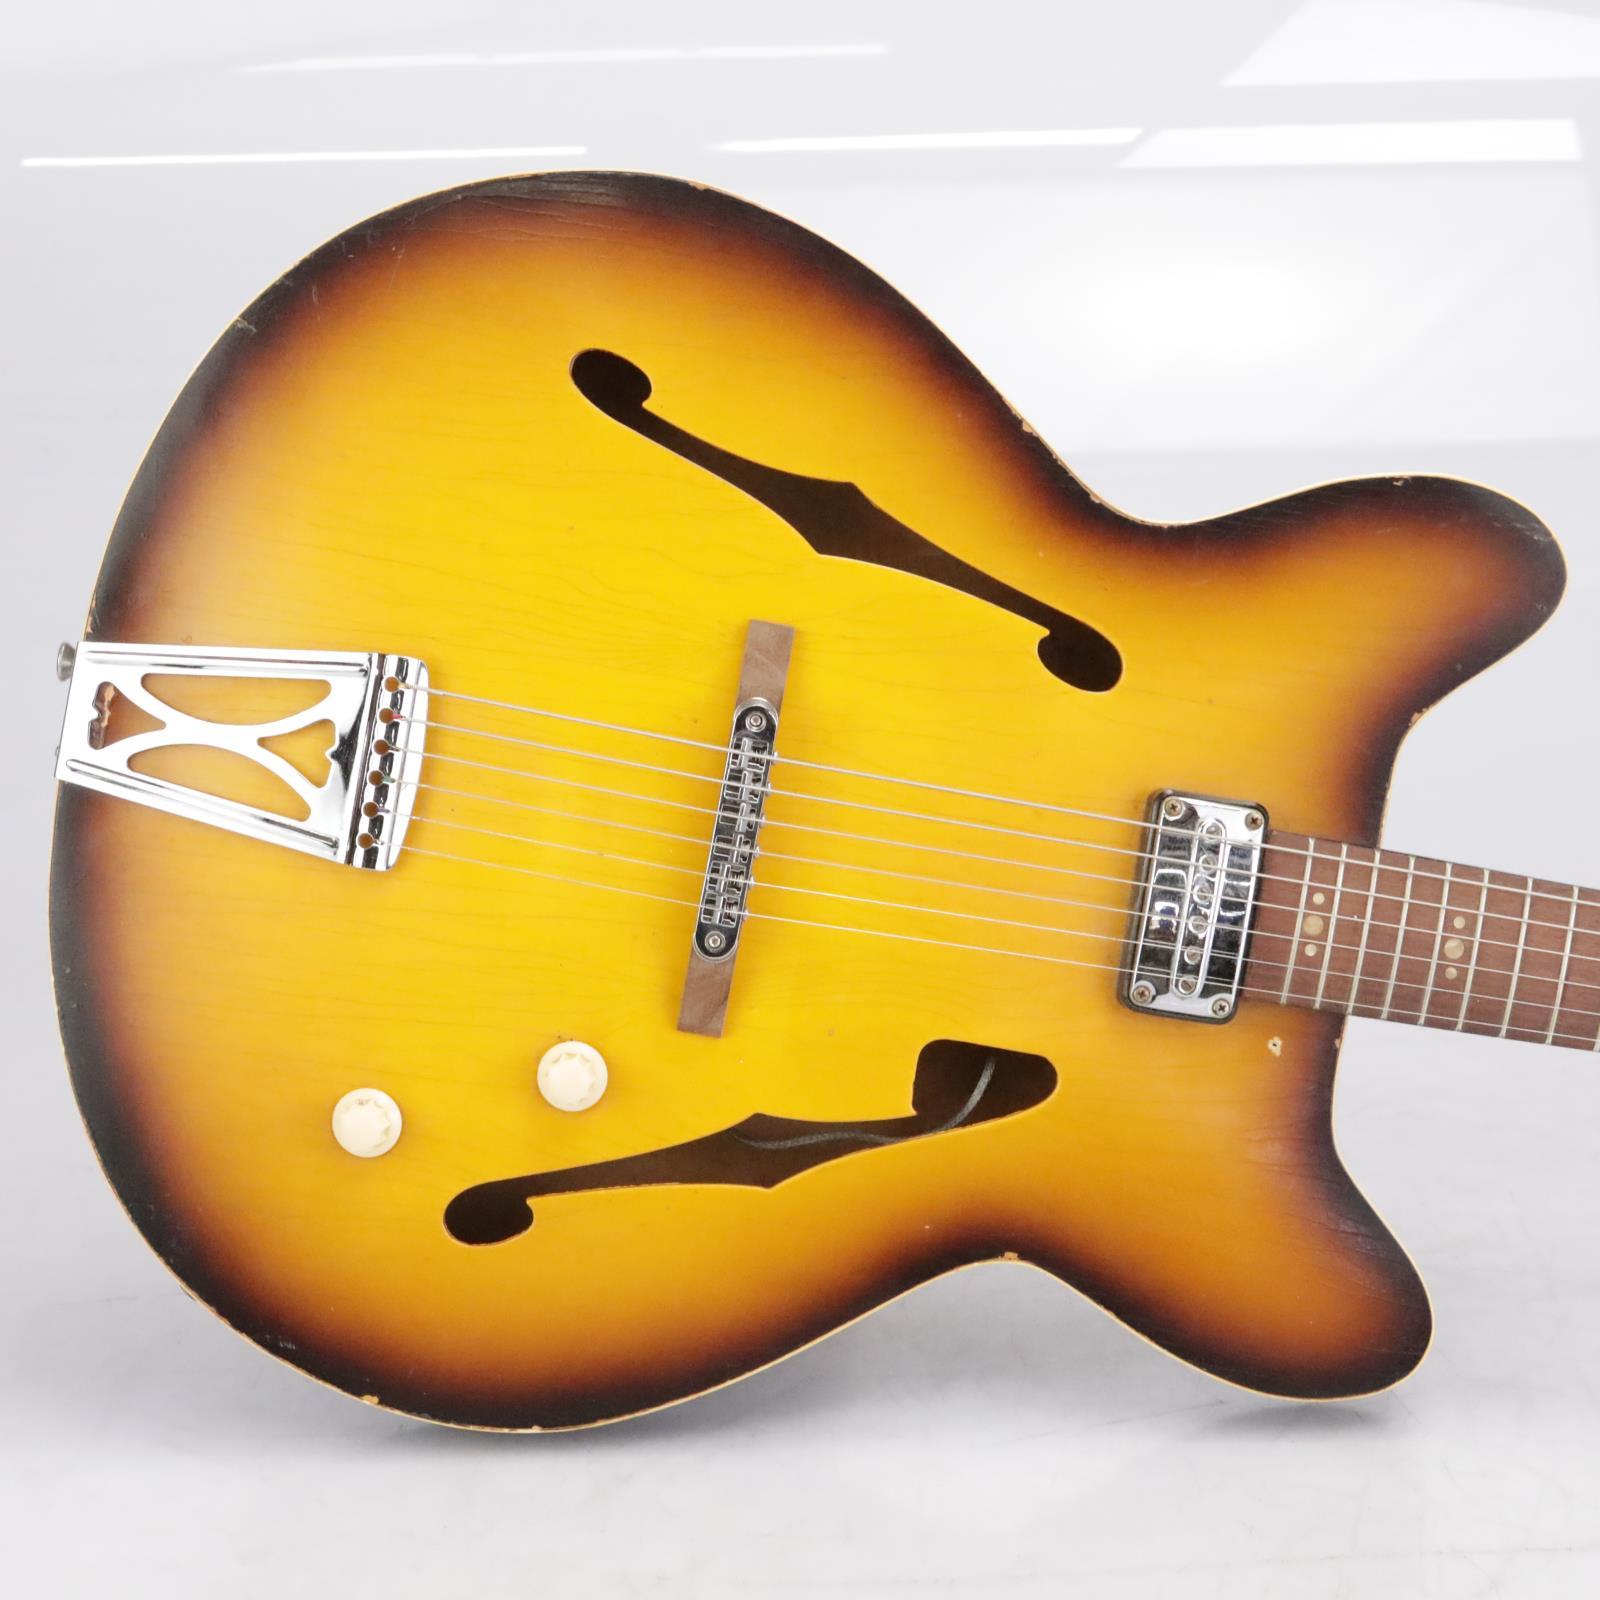 Vintage Egmond 7 Semi-Hollow Double-Cutaway Electric Guitar w/ Gig Bag #42525